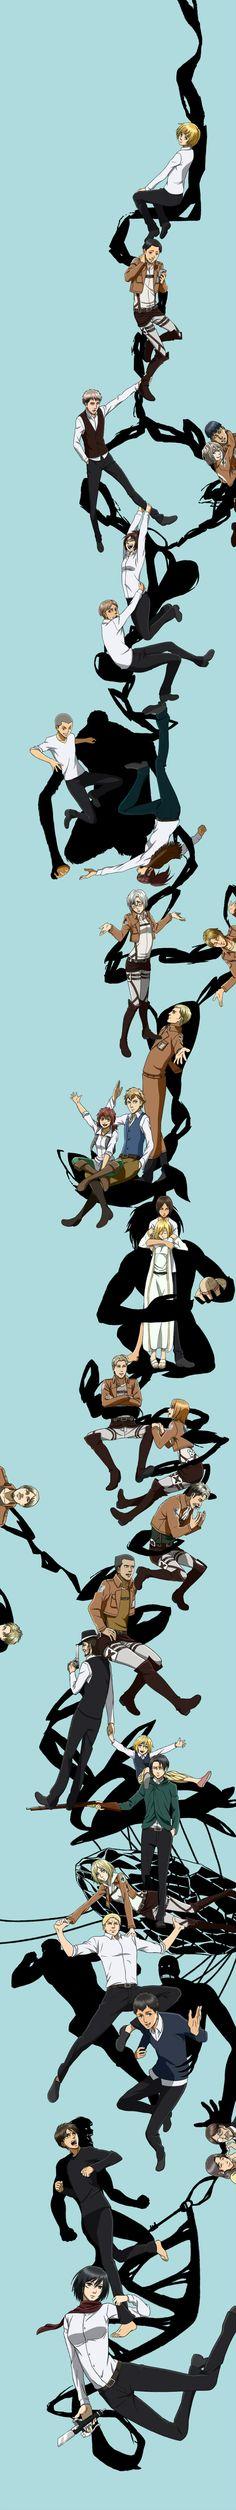 Durarara!! Ending - Never say never - Shingeki no Kyojin - attack on titan #anime